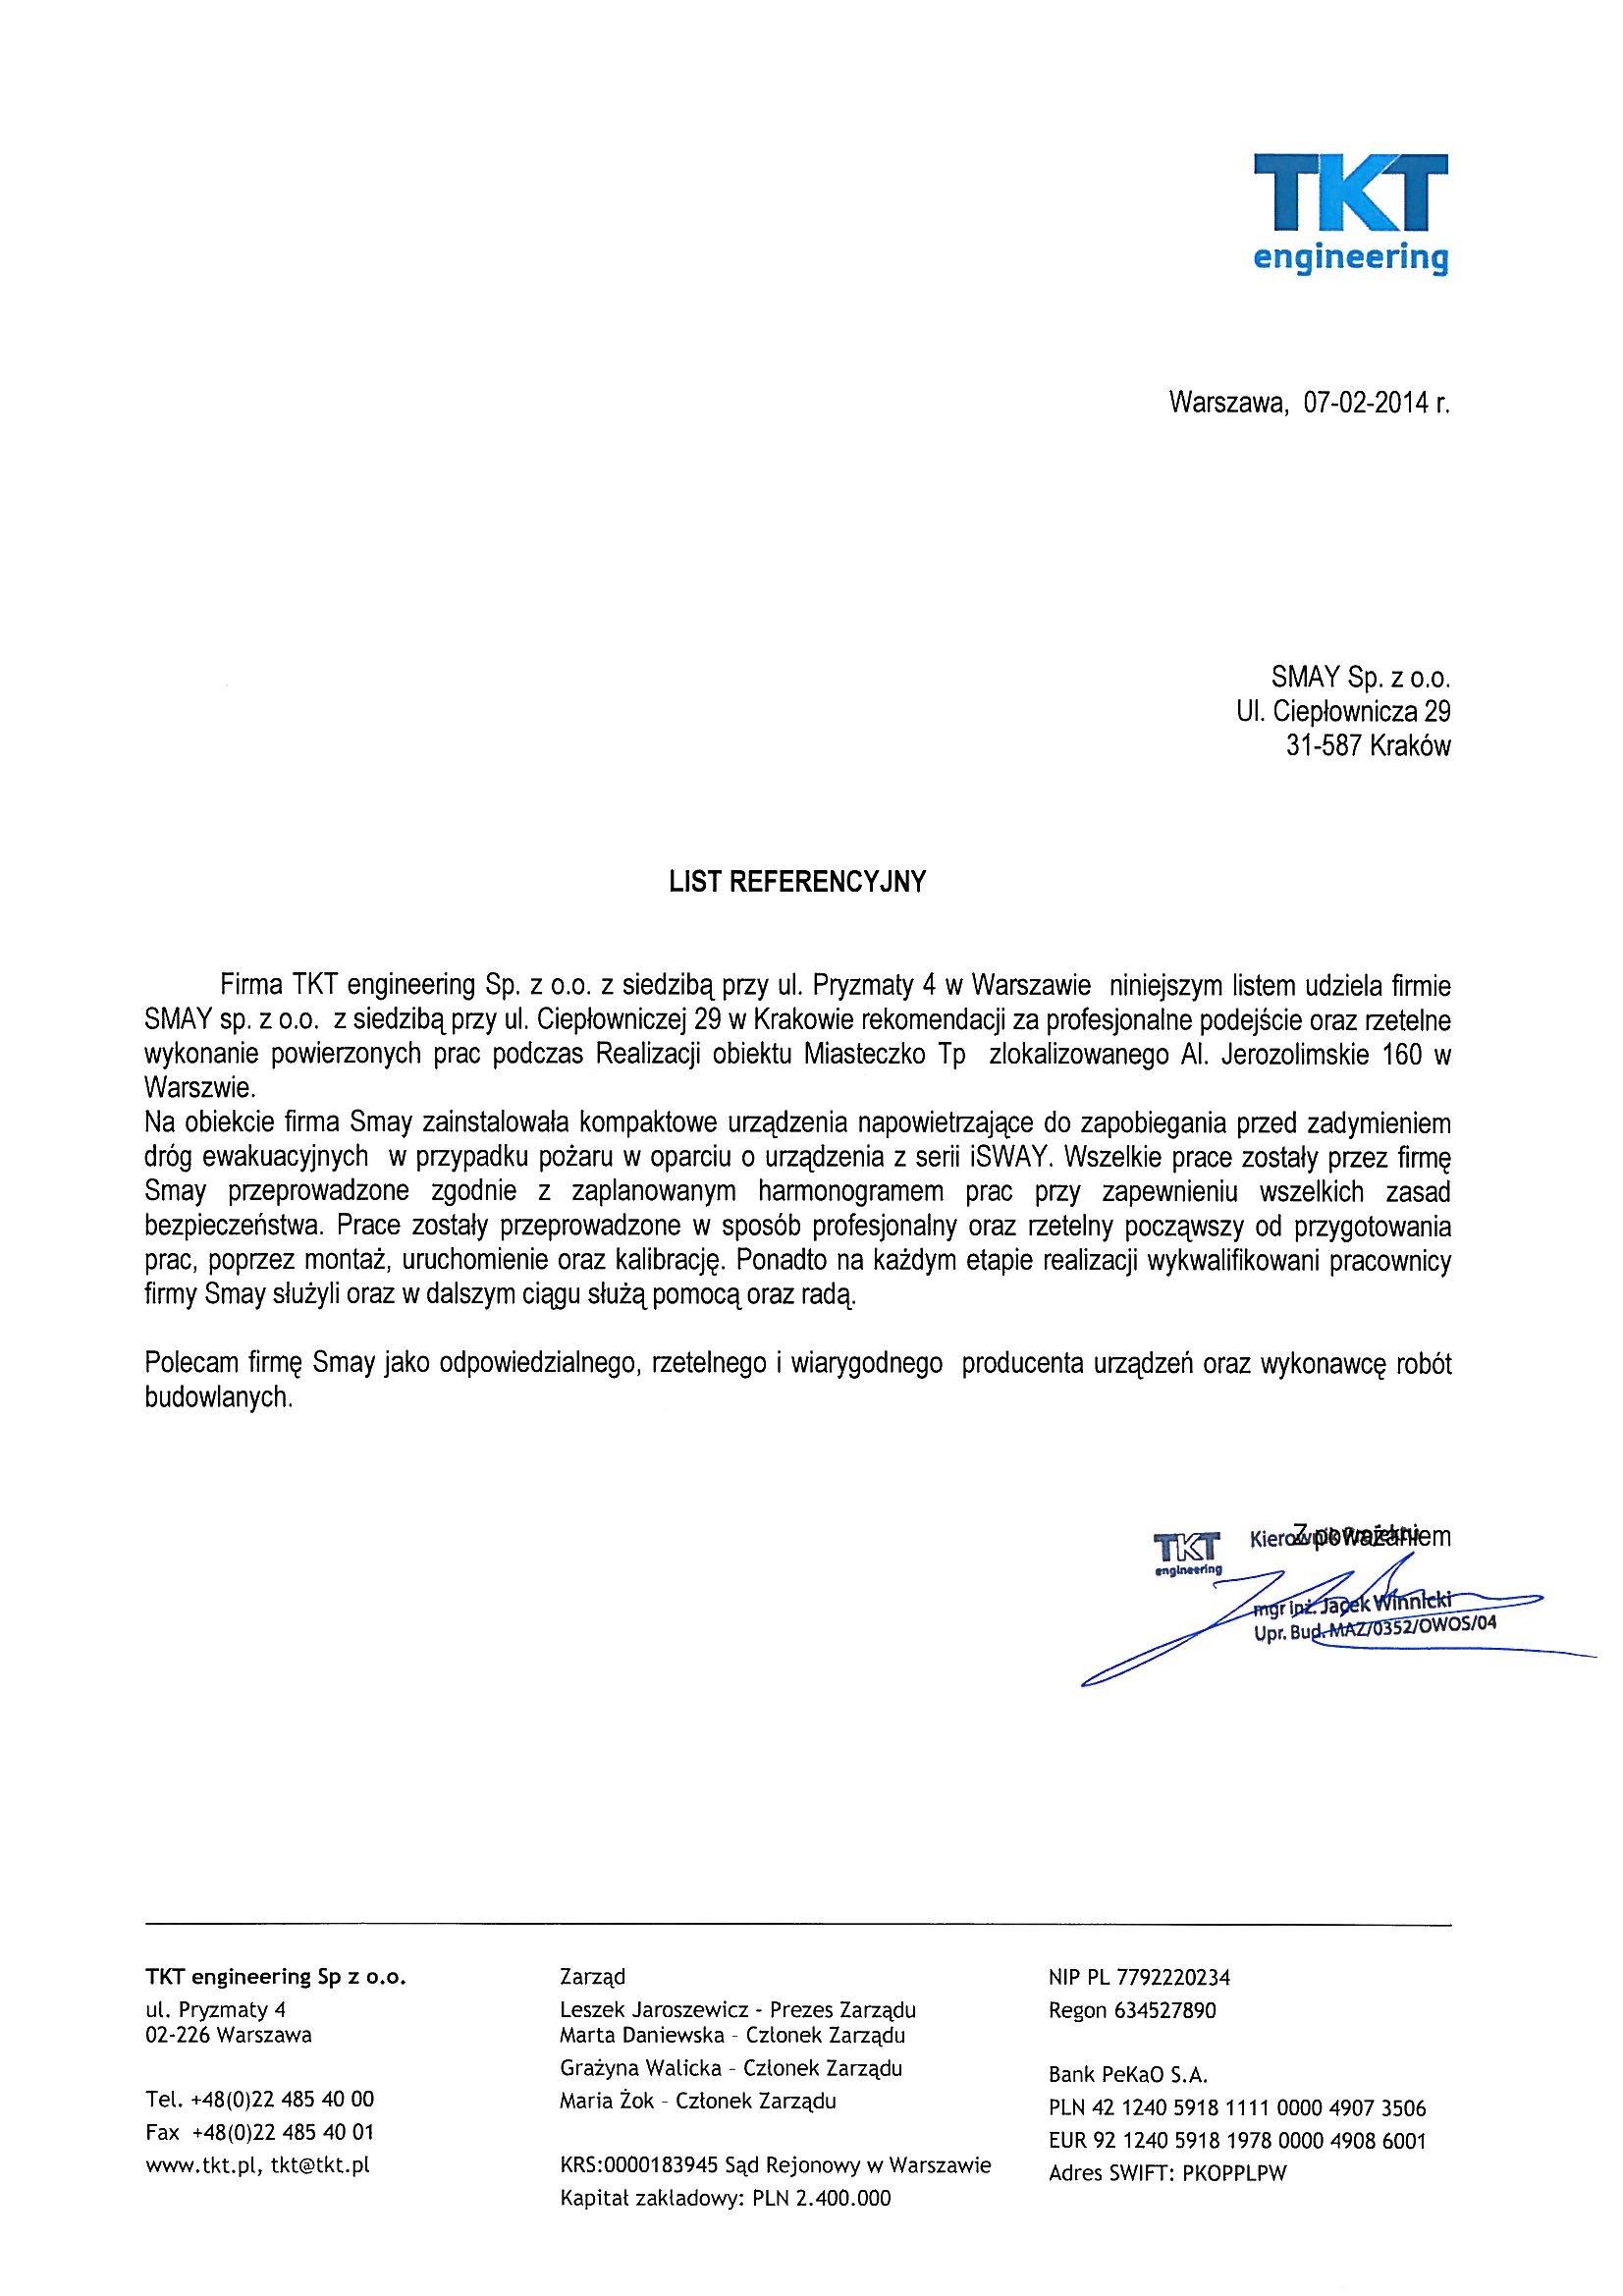 Referencja - TKT engineering Sp. zo.o.